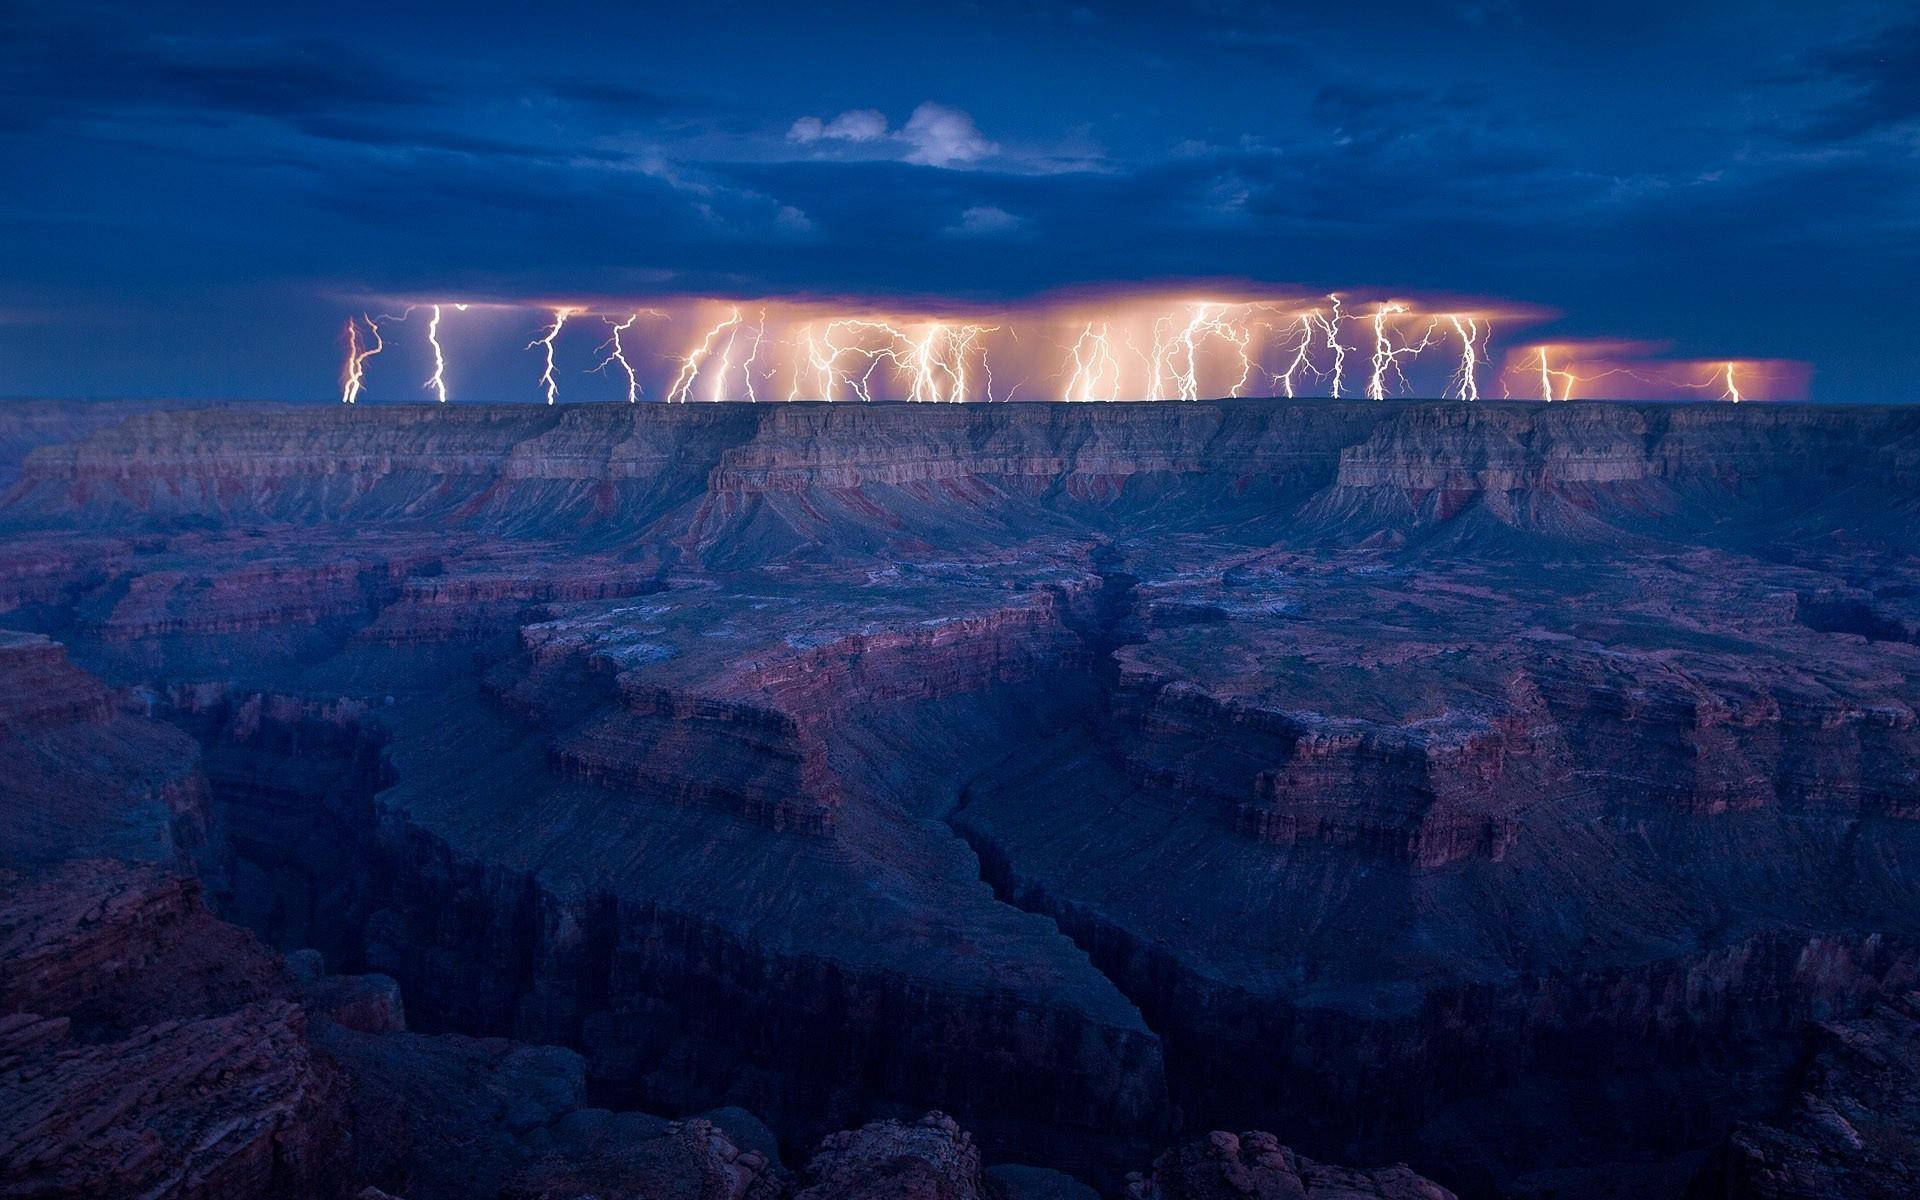 Thunderstorm Wallpaper Download Free Stunning Wallpapers